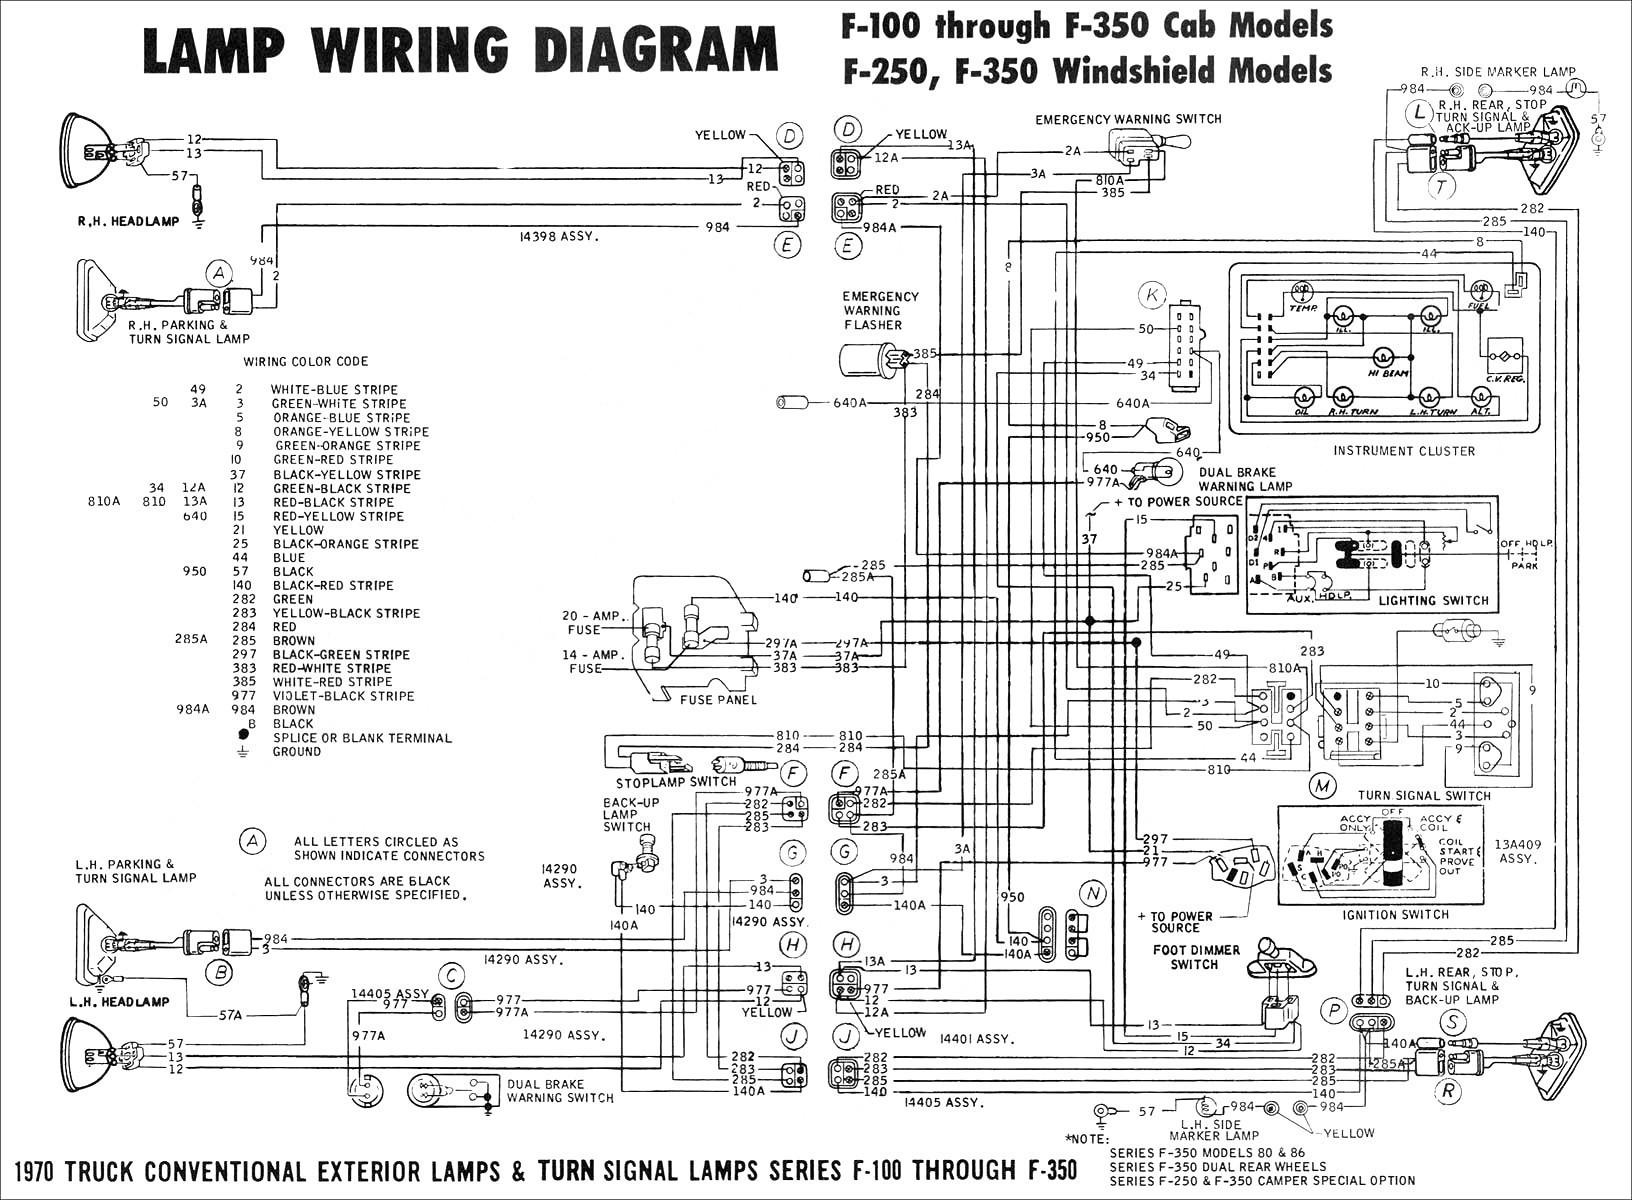 rav4 fuse diagram